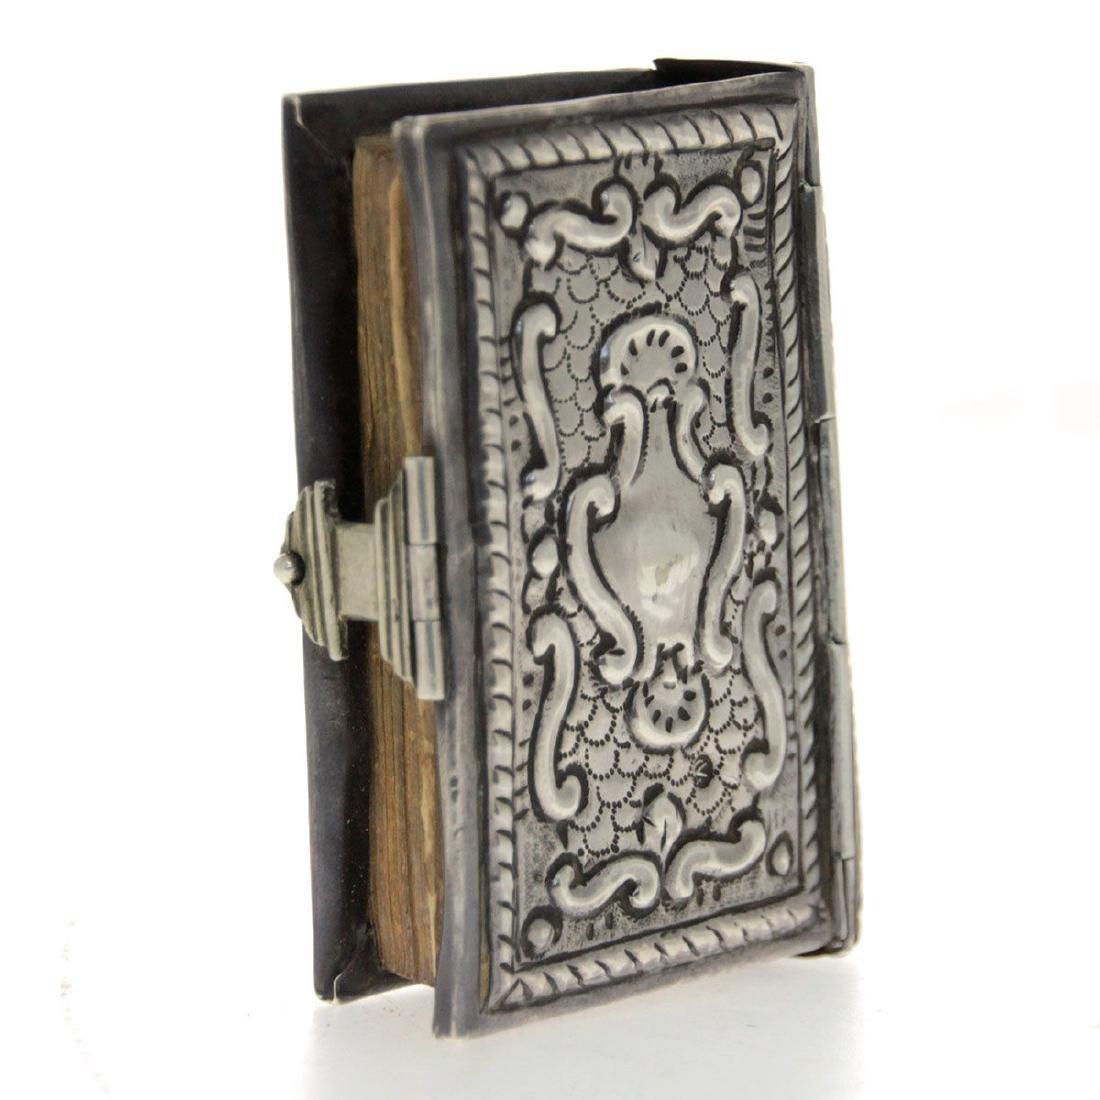 Rare Miniature Hebrew Prayer Book, Venice, 1731